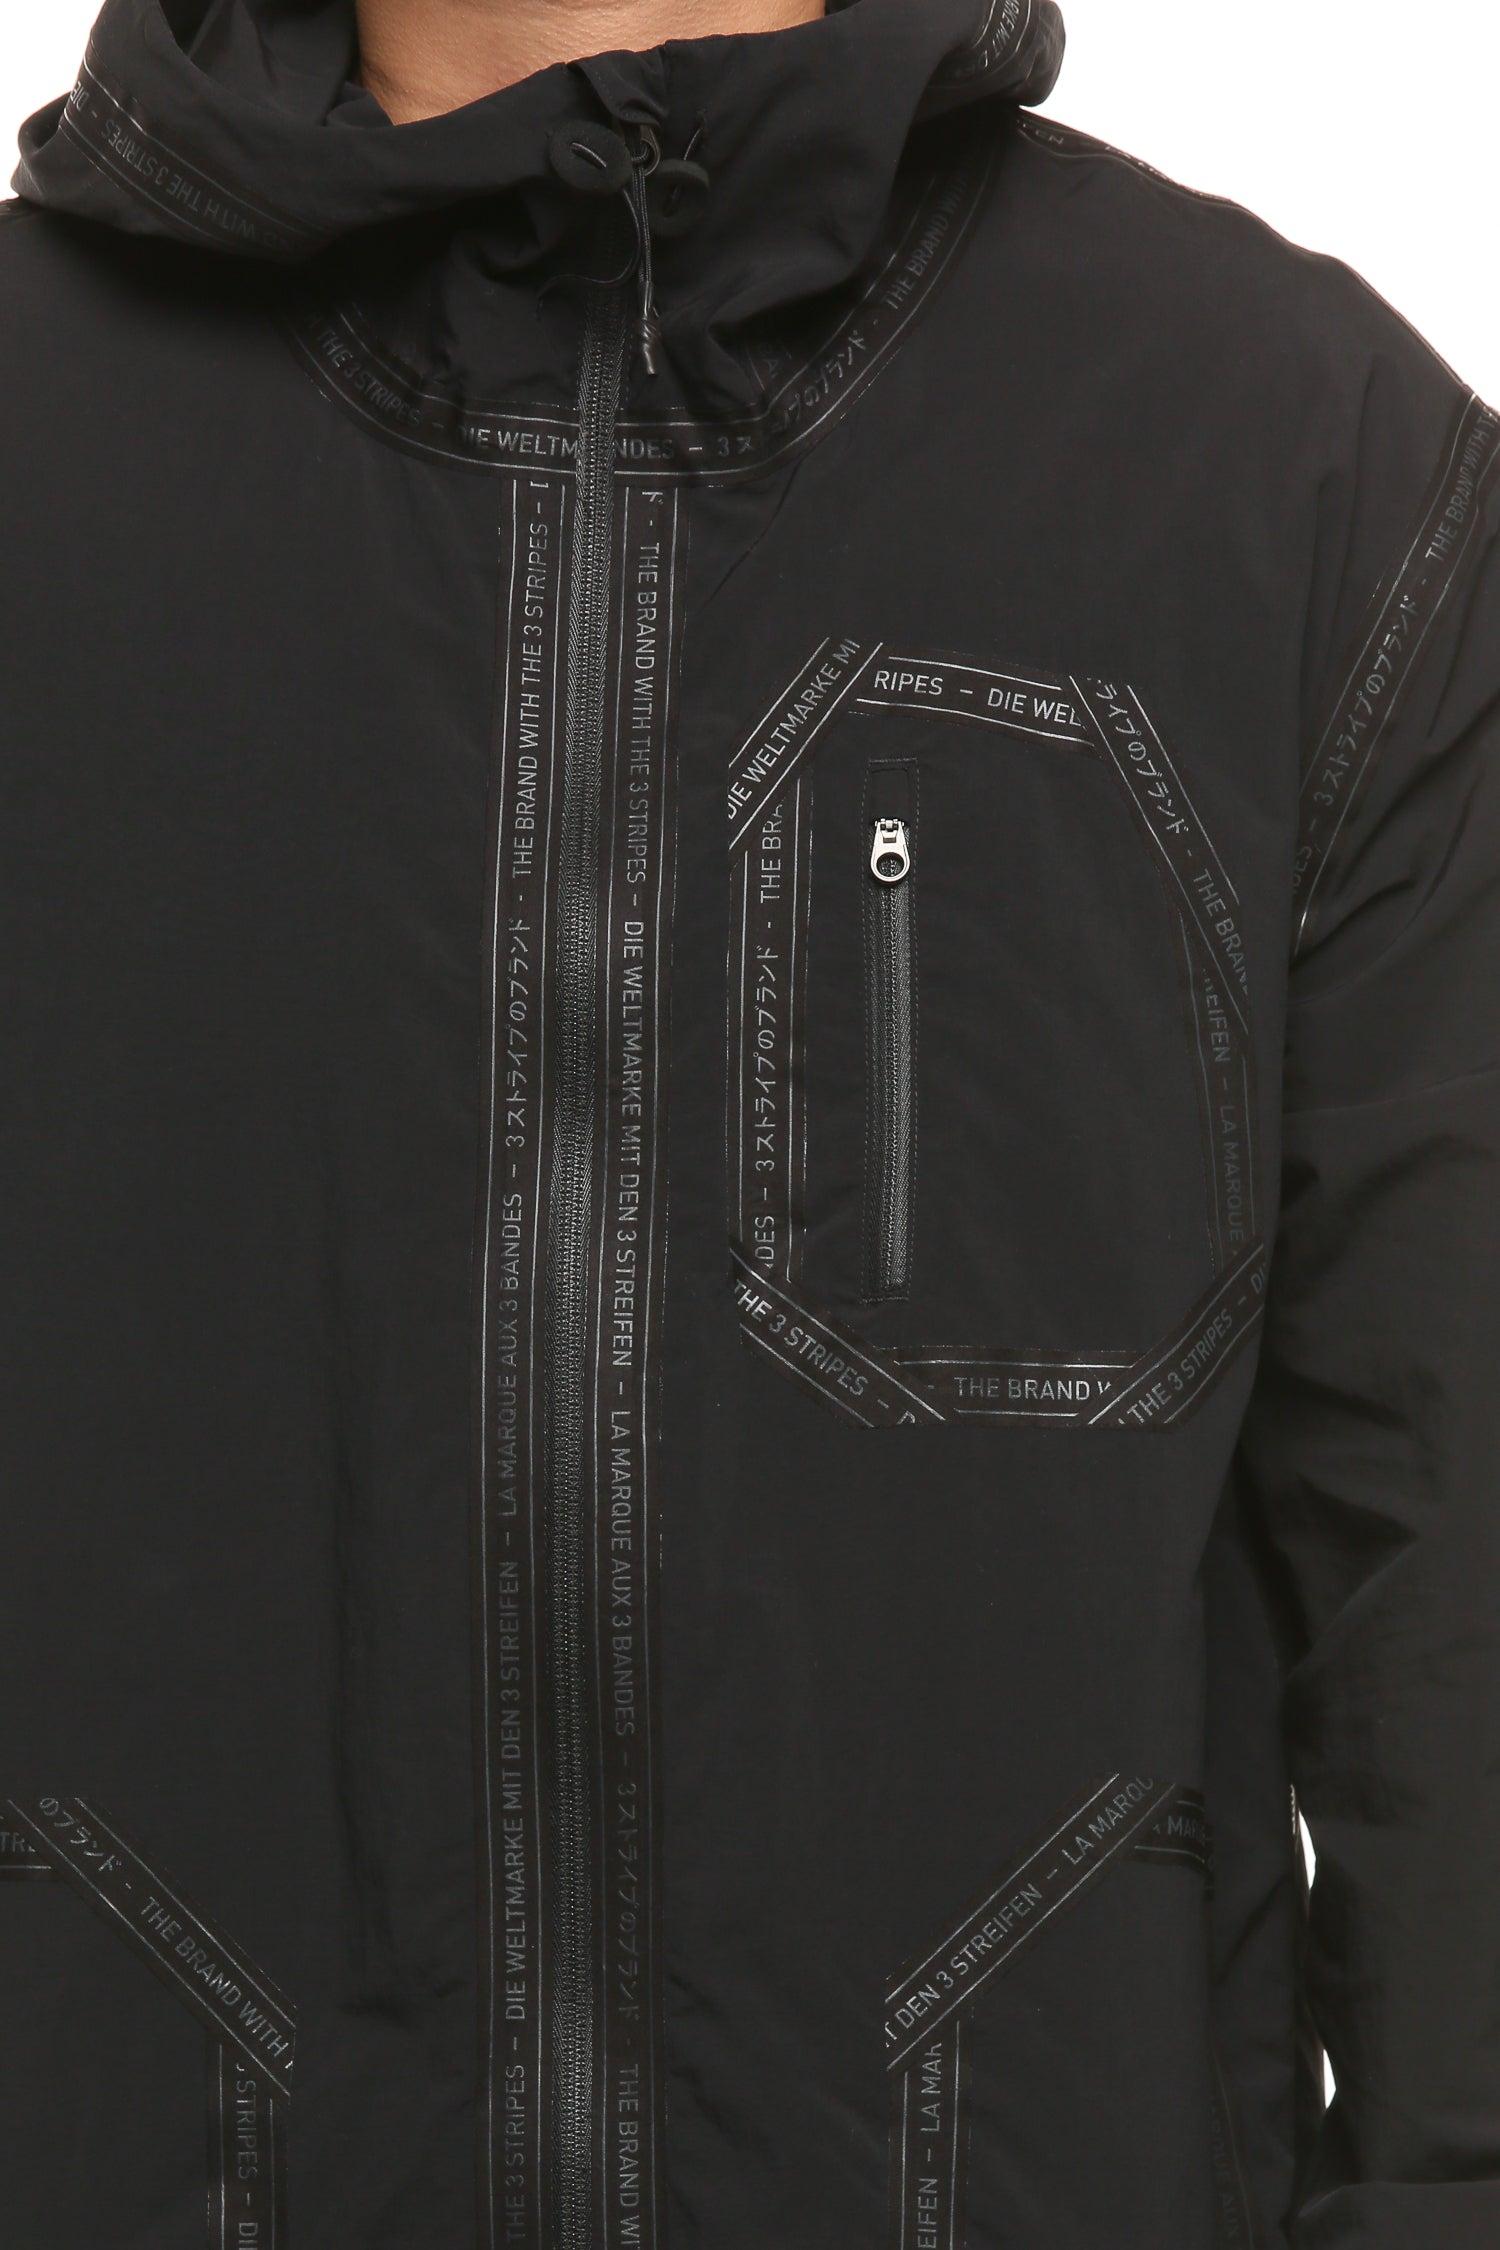 Adidas NMD Field Jacket Black | Culture